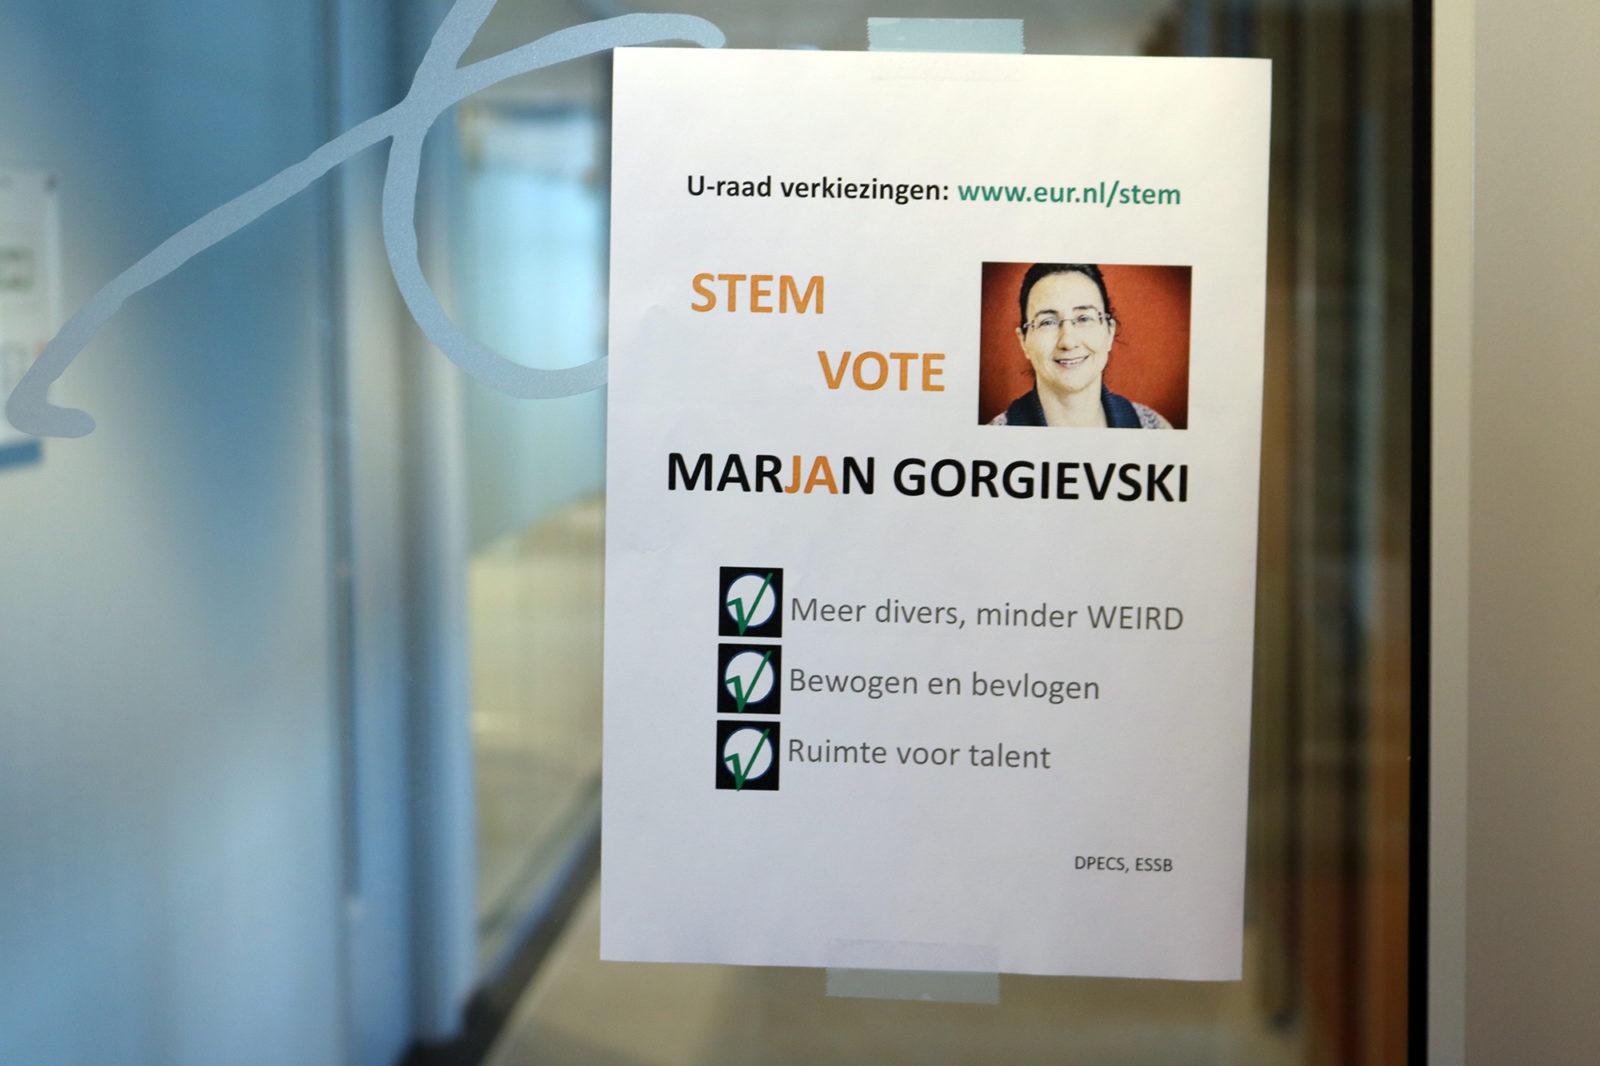 Marjan-Gorgievski